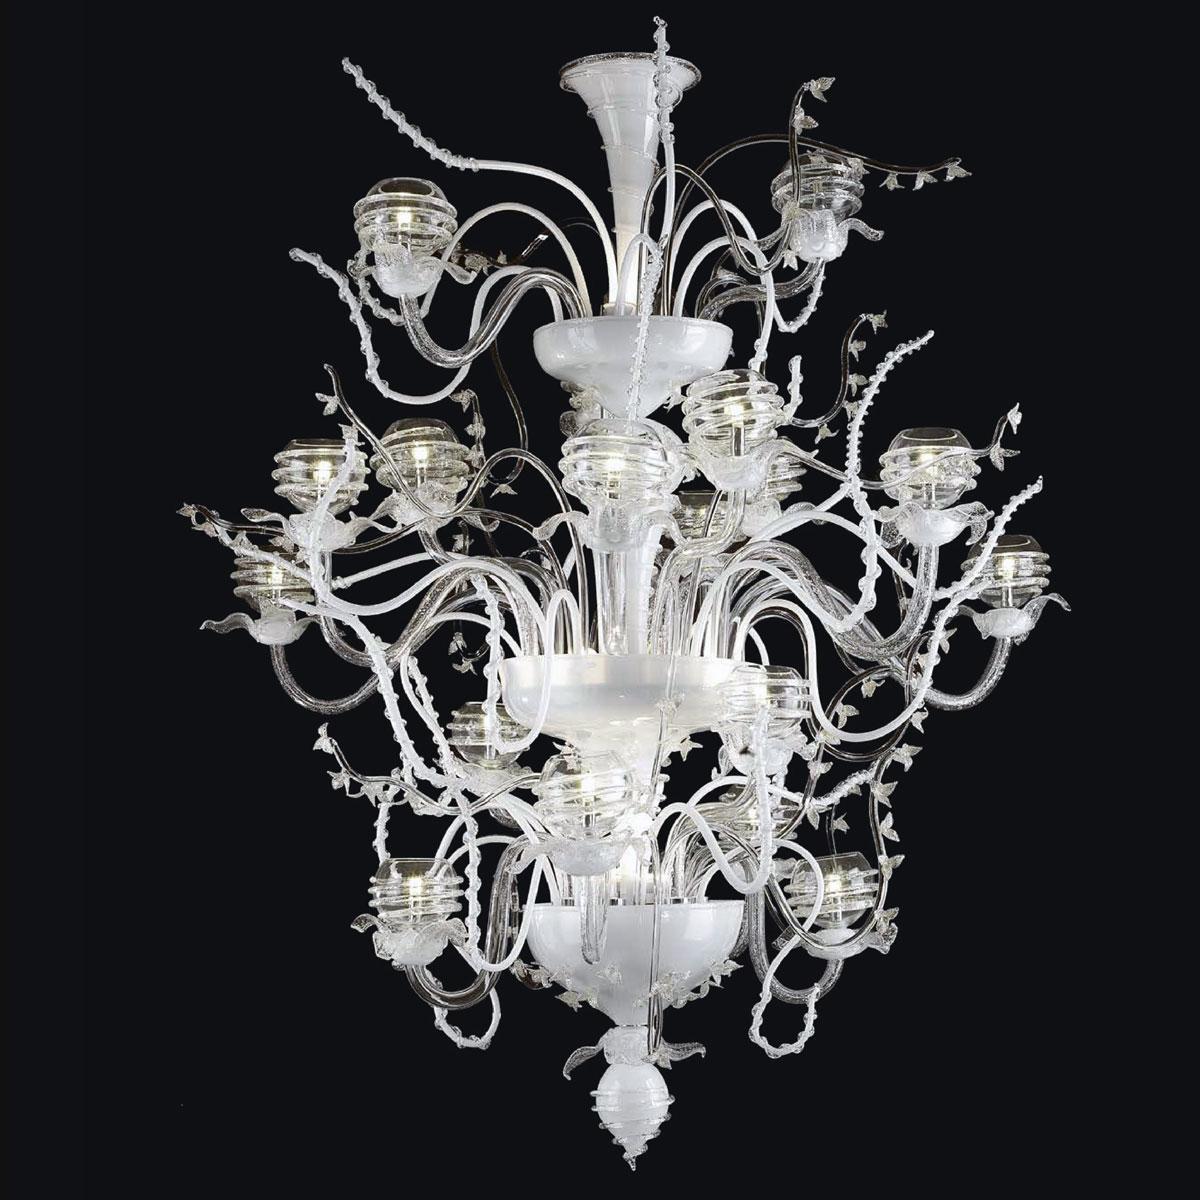 """Dakota"" lampara de araña de Murano - 18+7 luces - transparente, blanco y plata"